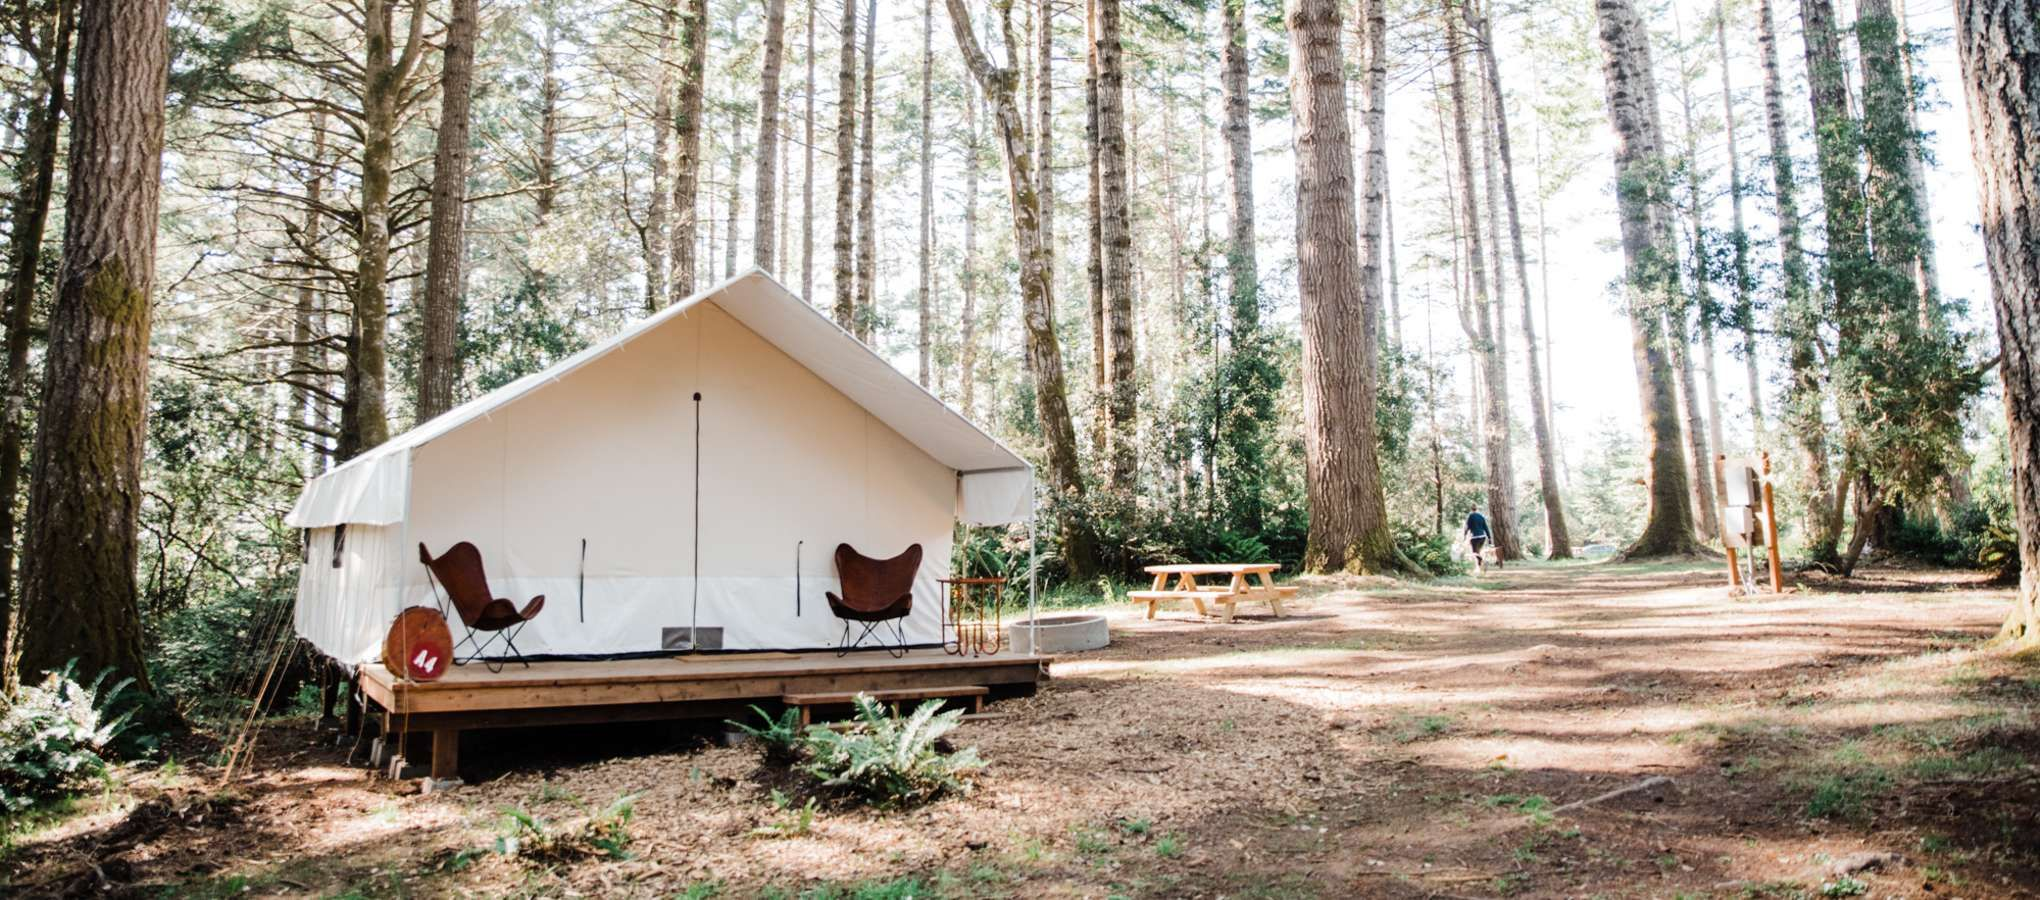 Modern Mendocino Camping Classic Mendocino Grove Ca 62 Hipcamper Reviews And 84 Photos Mendocino Camping Glamping California Glamping Spots